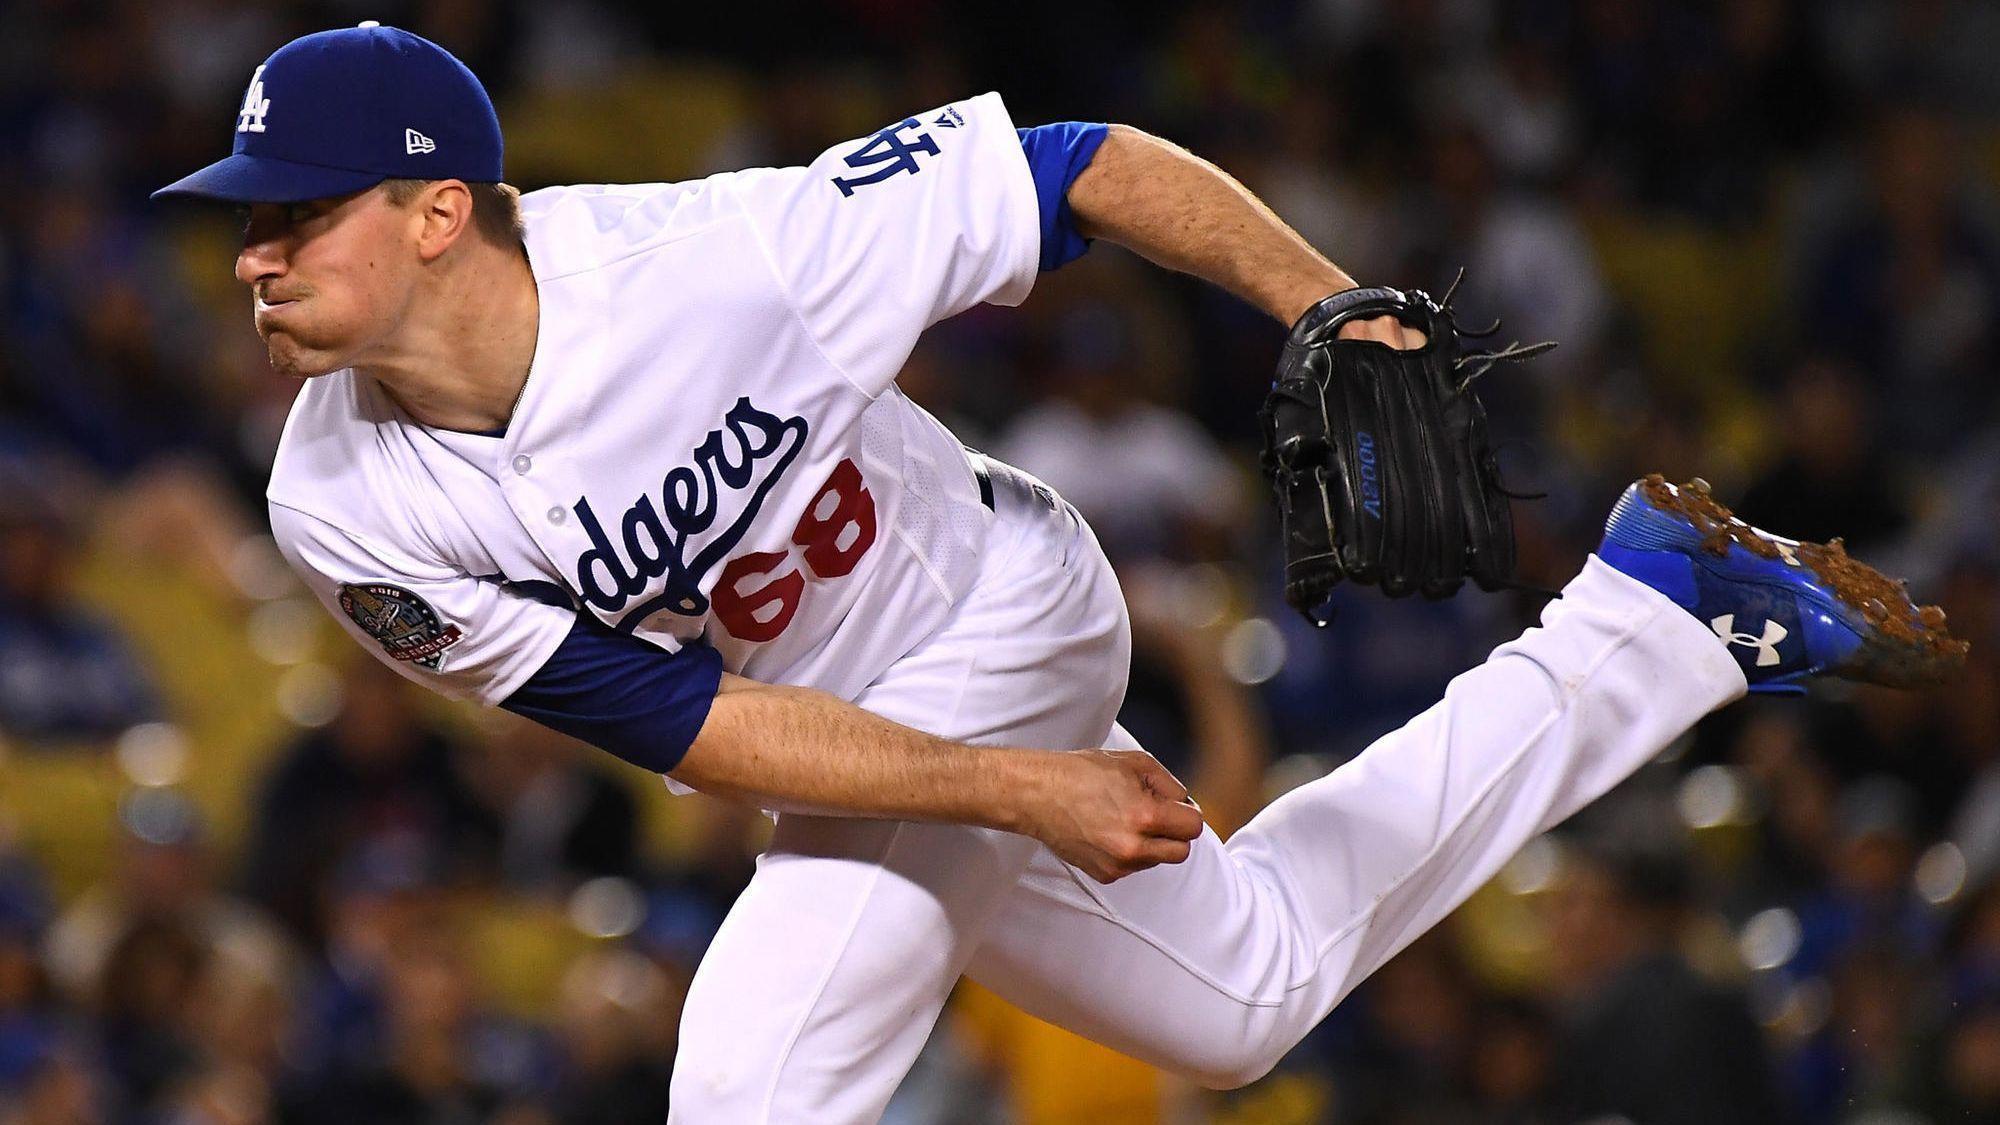 Dodgers pitcher Ross Stripling makes All-Star team; Max Muncy doesn't win fan vote